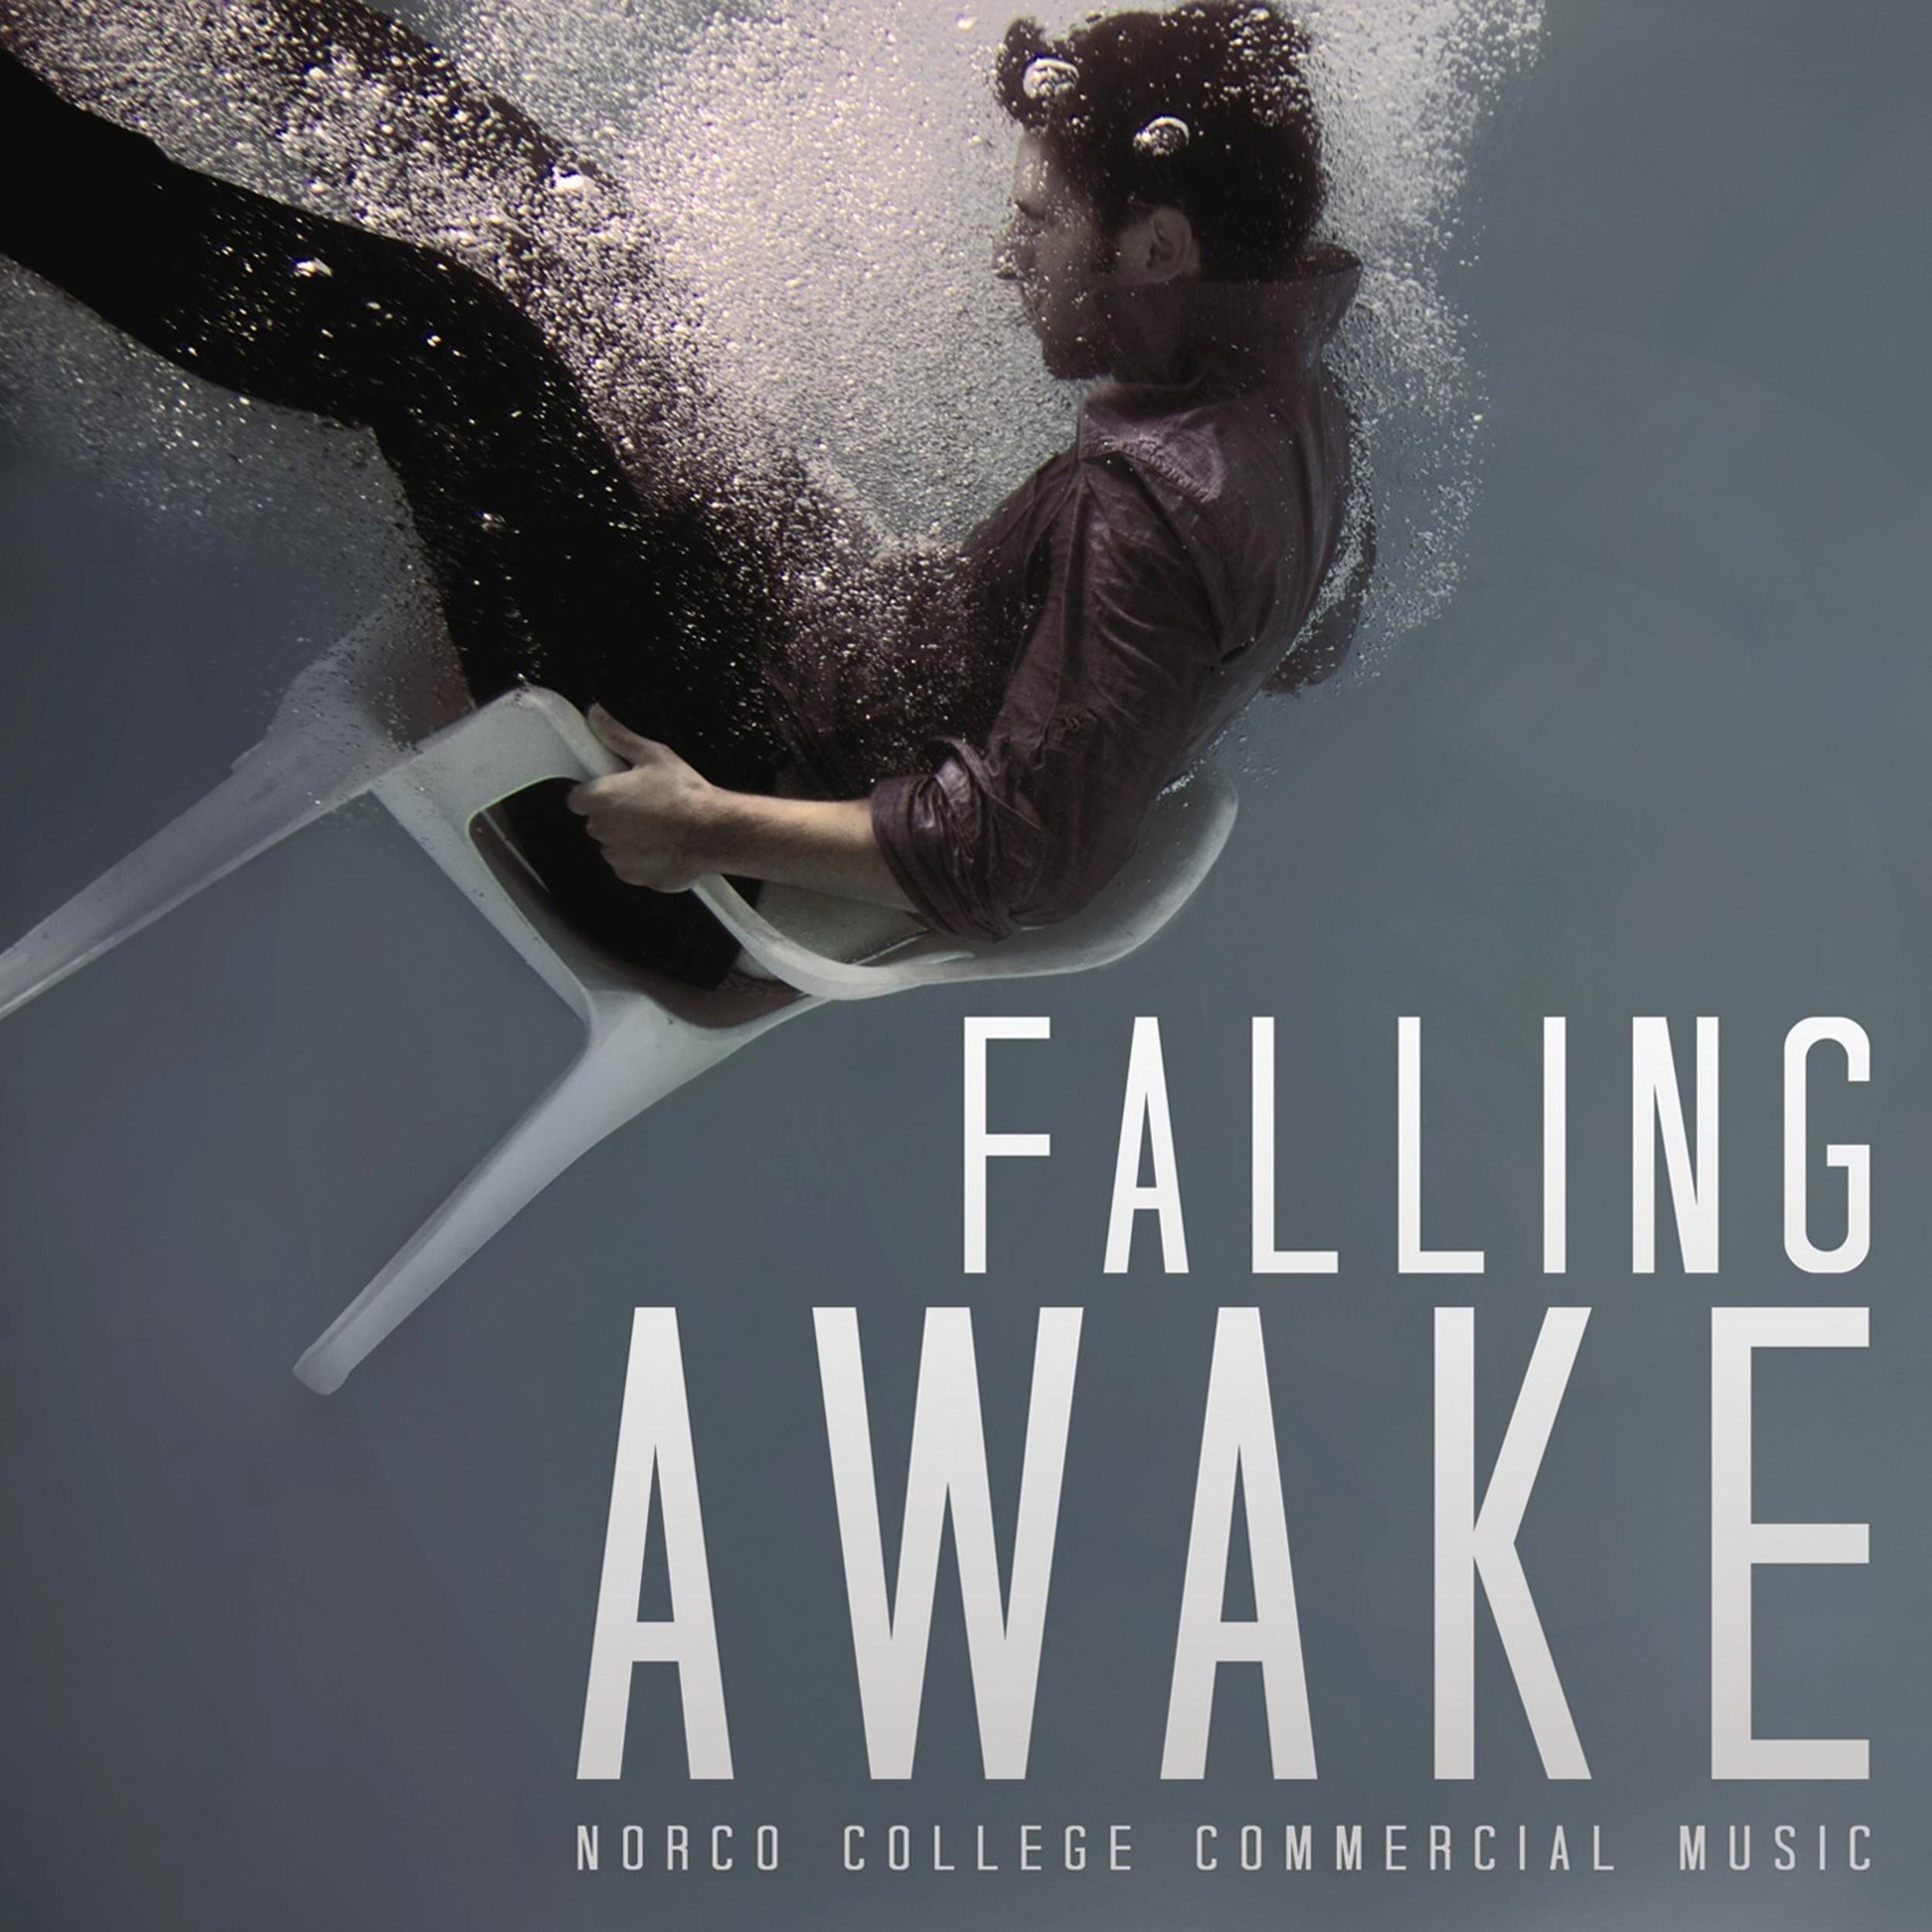 Falling Awake Cover.jpg